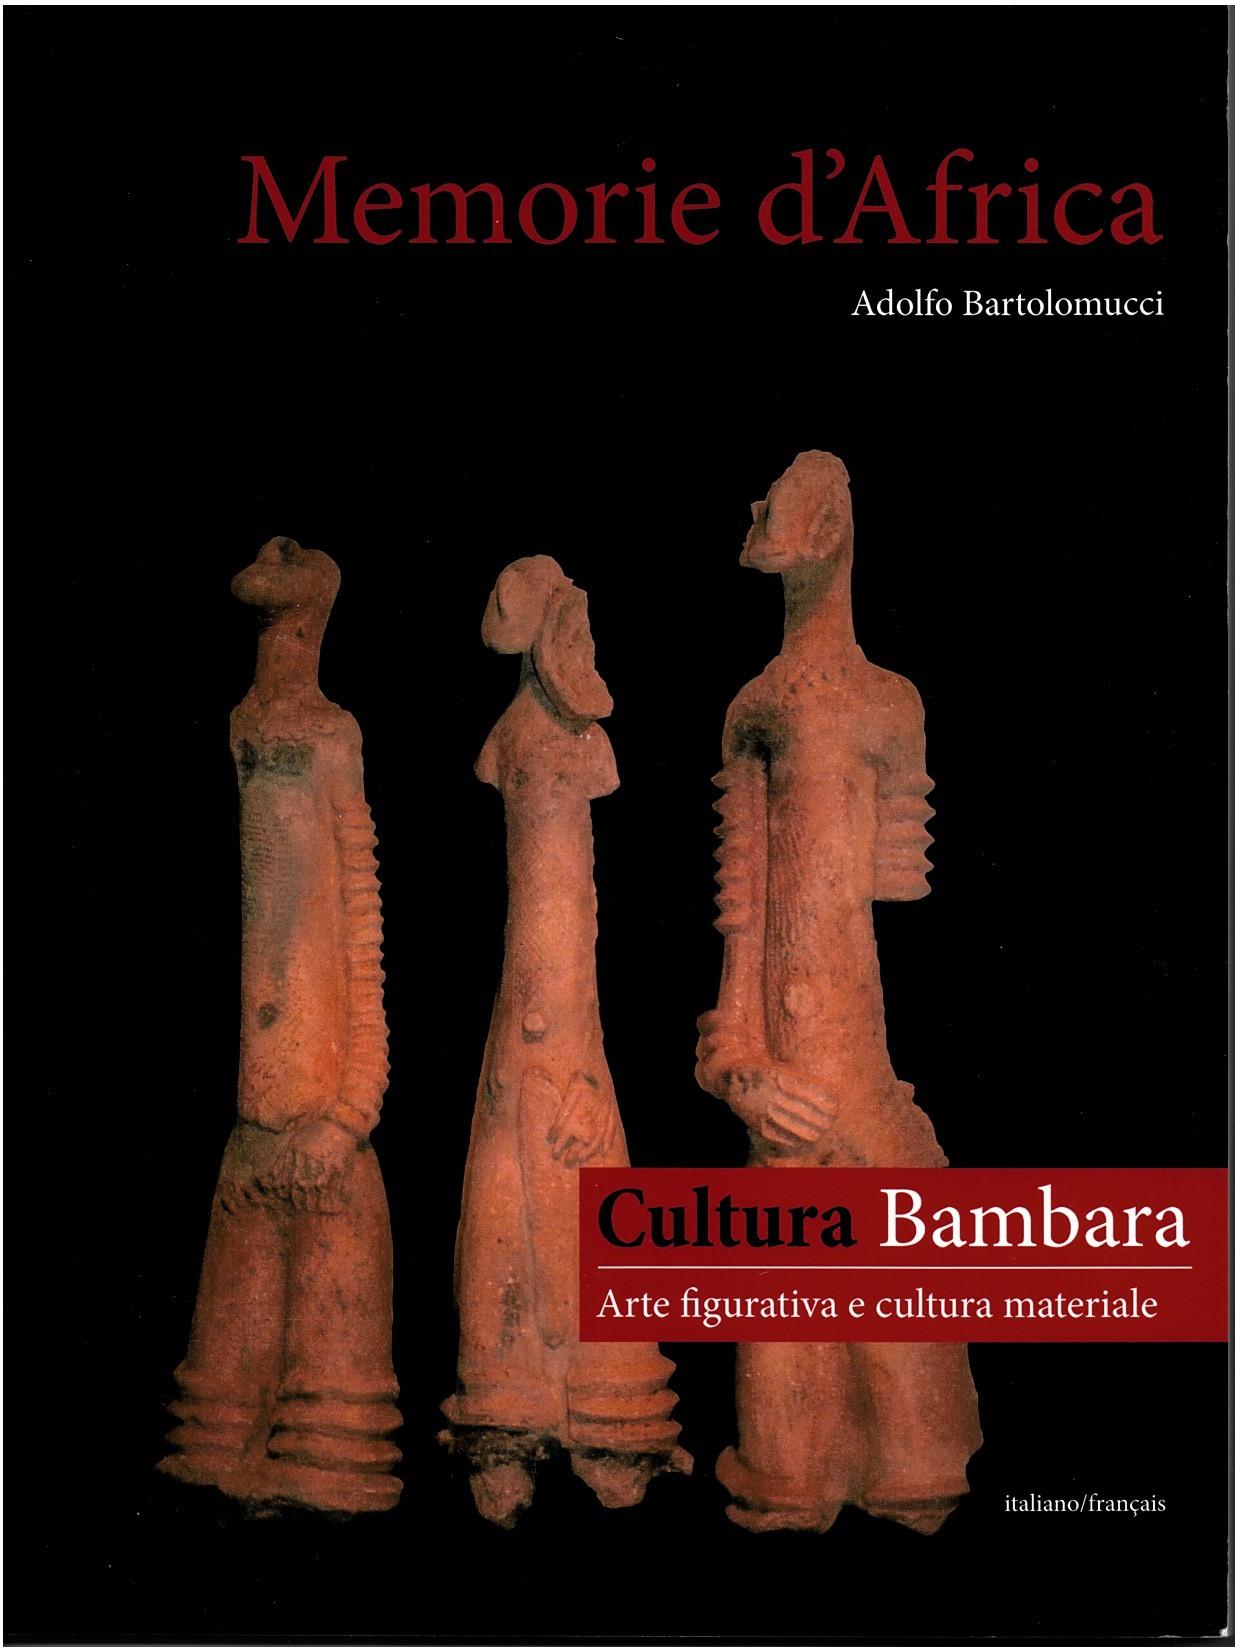 livre Memorie d'Africa - Cultura Bambara